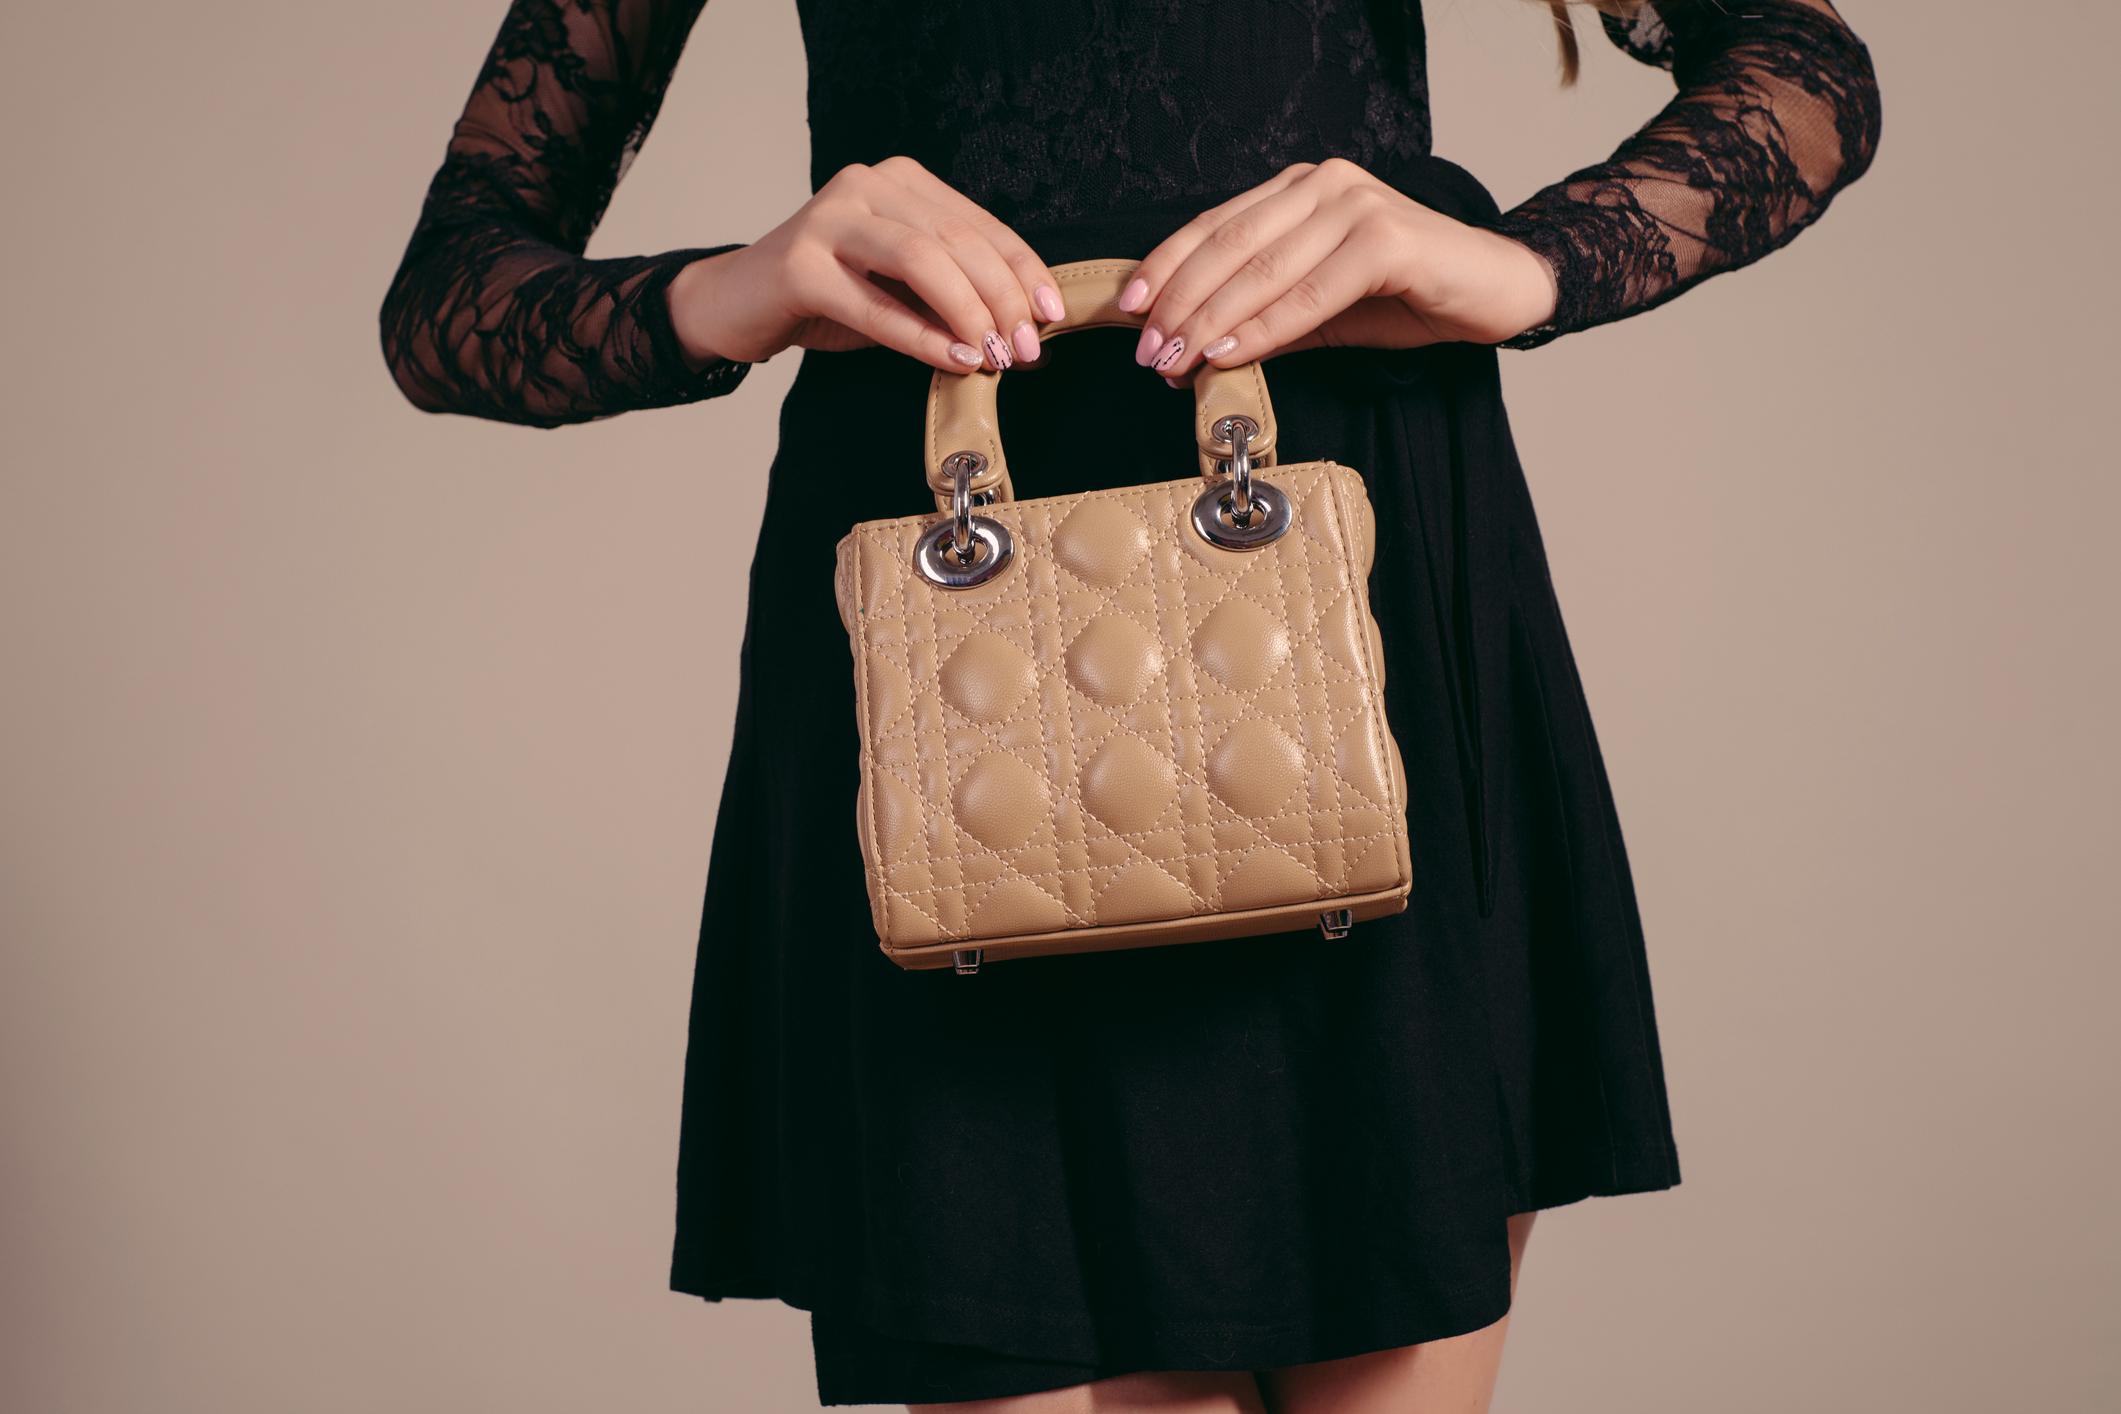 Woman in stylish black dress holding luxury handbag.